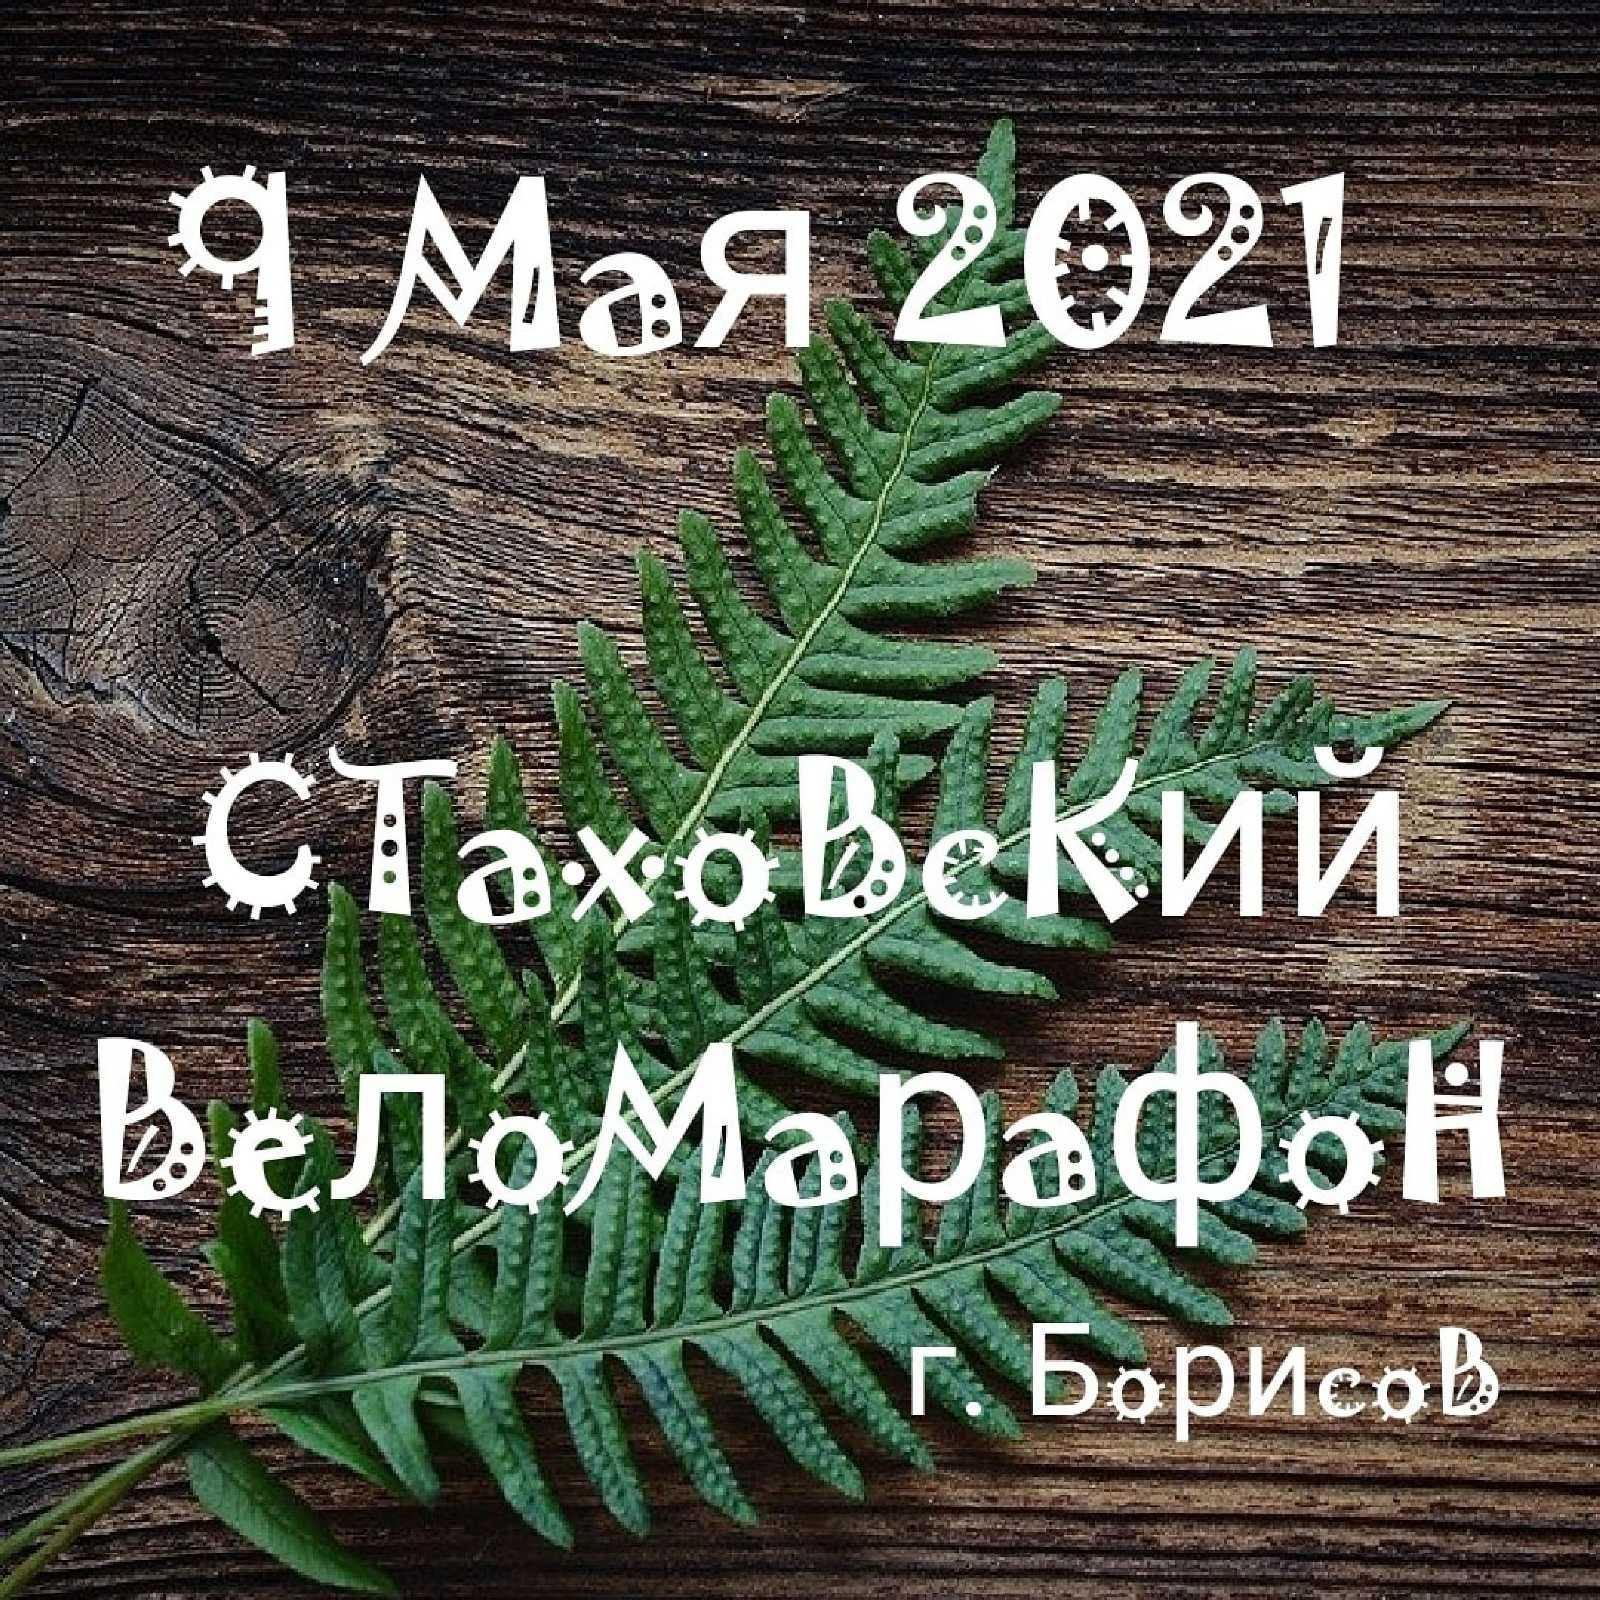 СТАХОВСКИЙ МАРАФОН г. Борисов